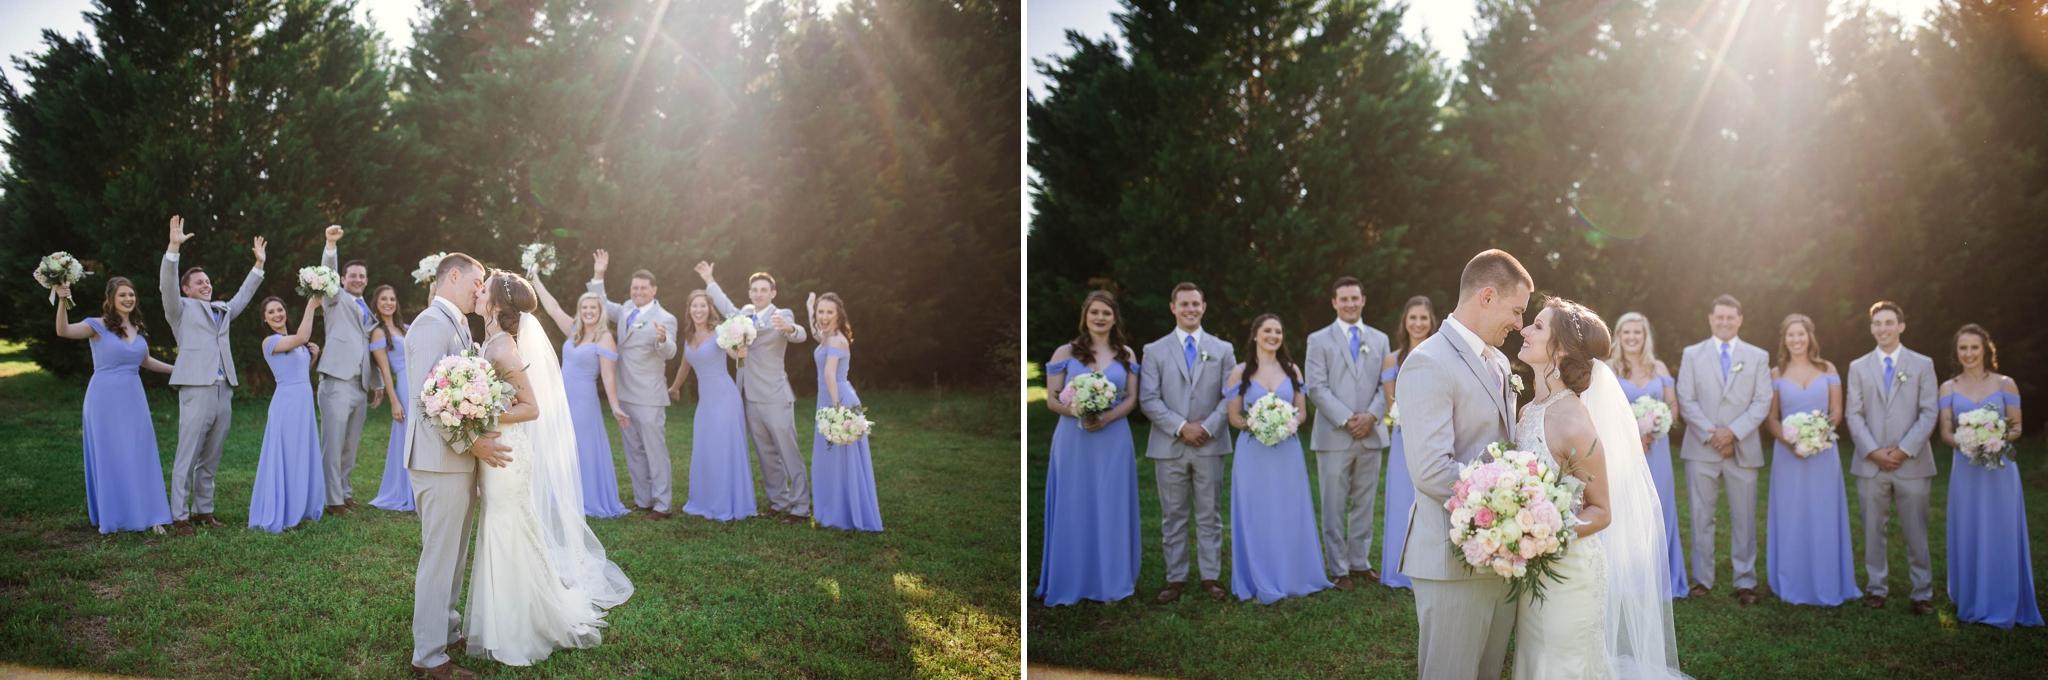 Paige + Tyler - Wedding at Rand Bryan House in Garner, NC - Raleigh North Carolina Photographer